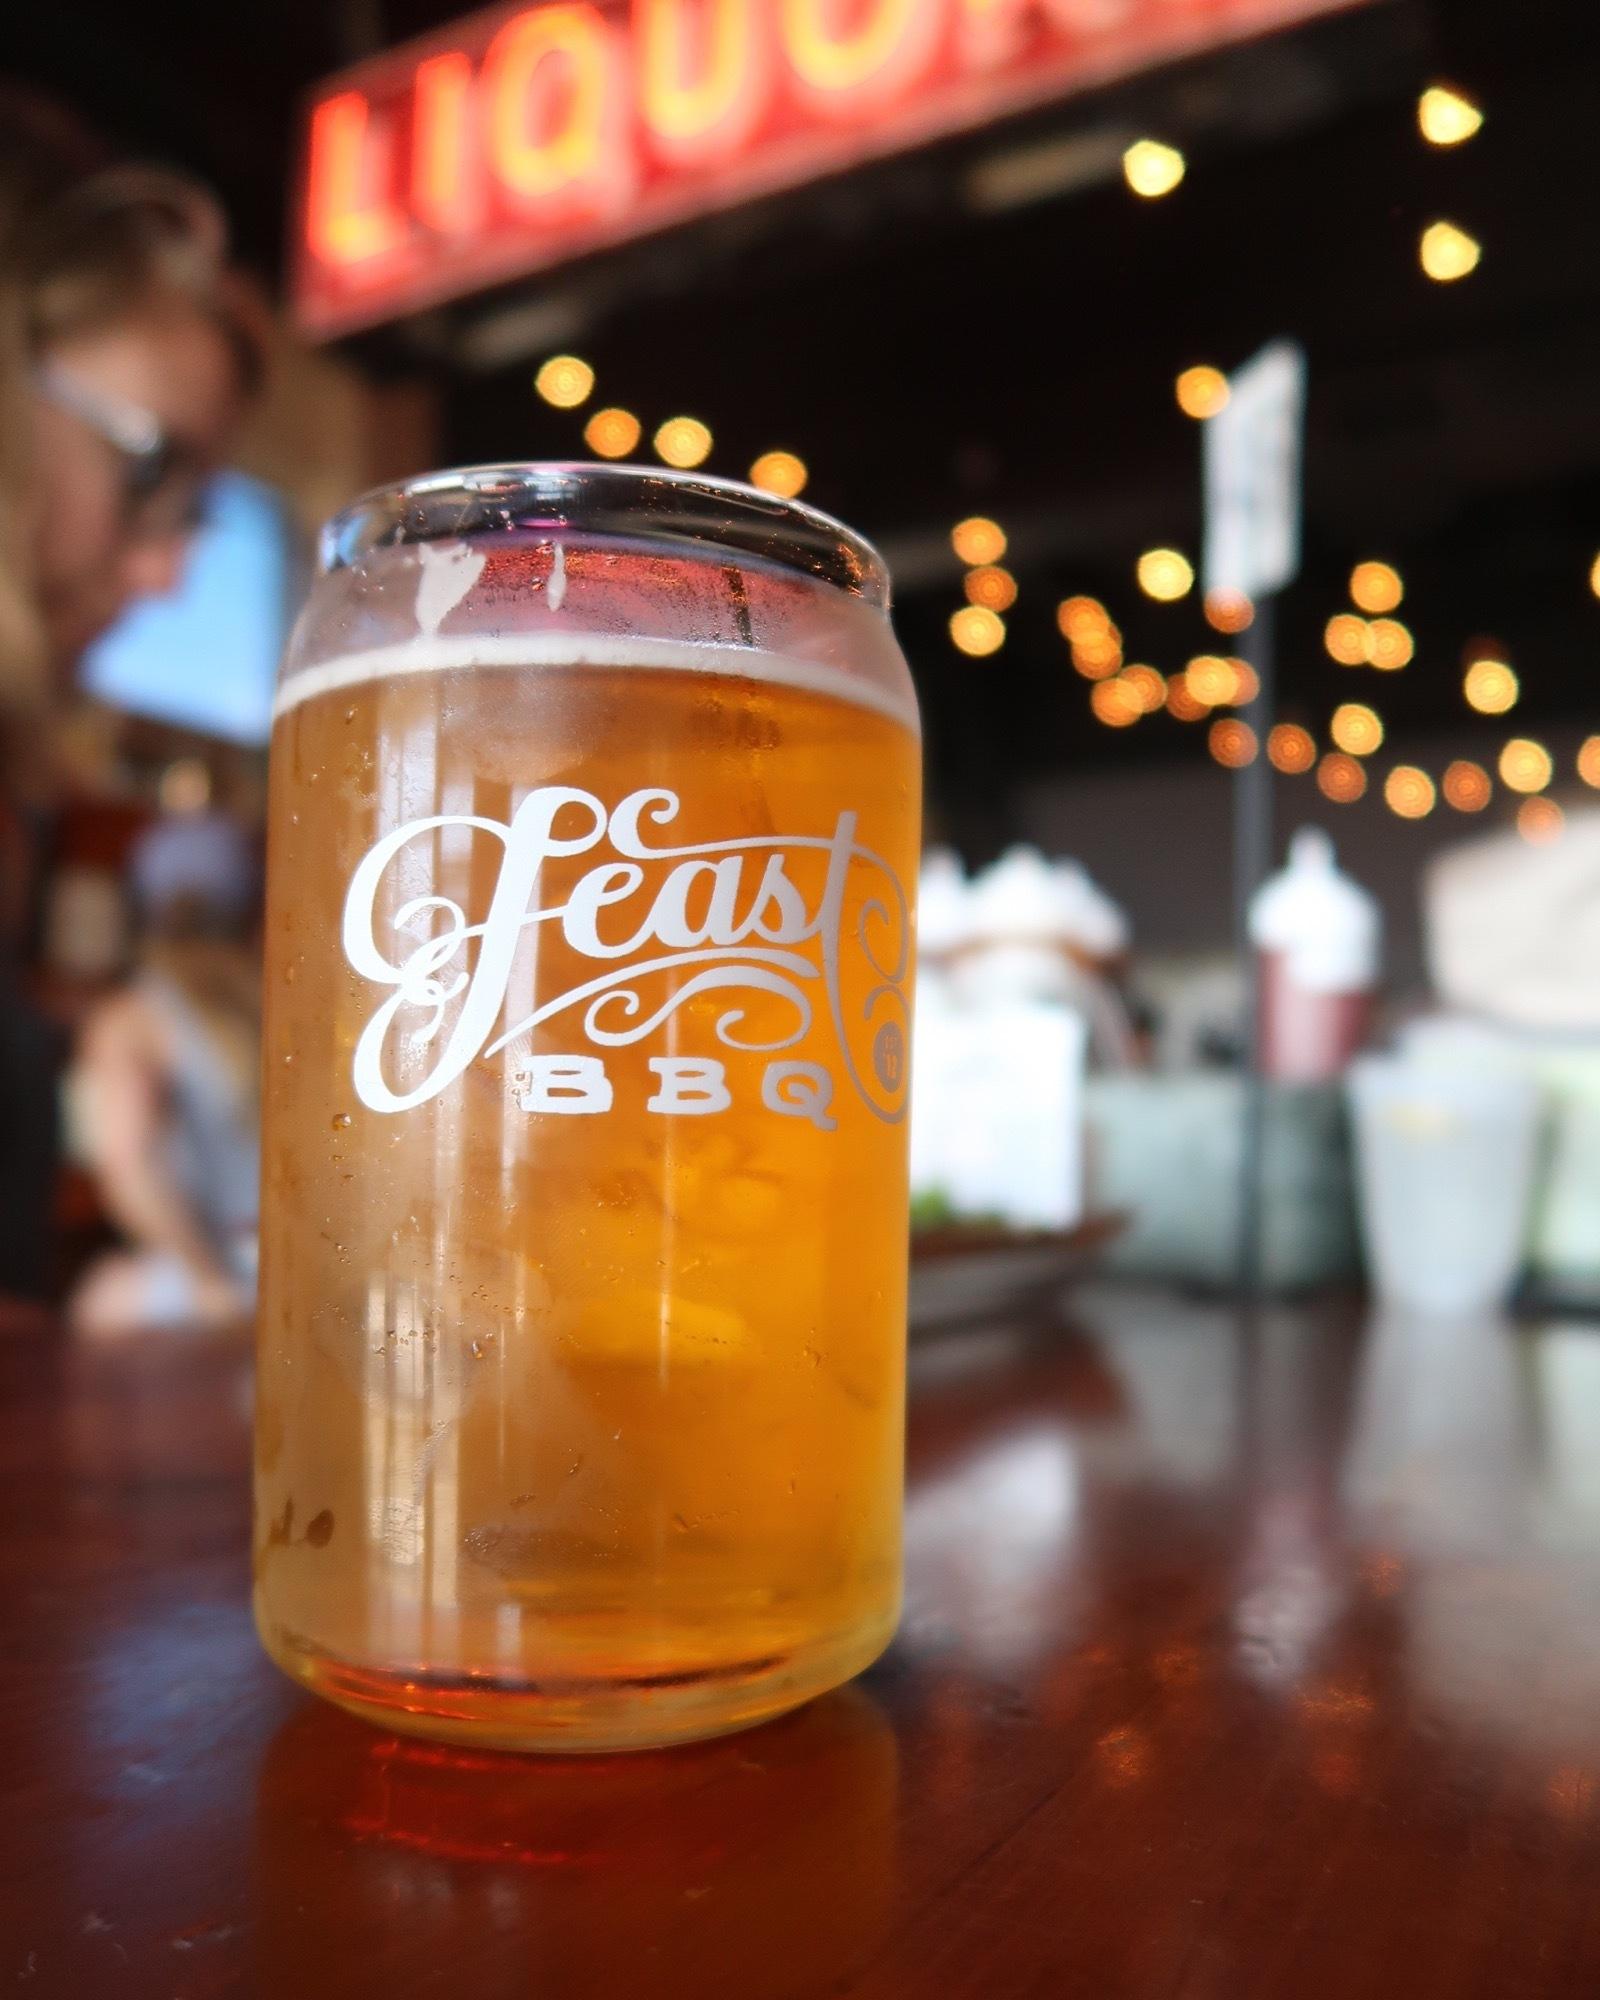 Feast BBQ: Best Places to Drink Beer in Louisville, Kentucky